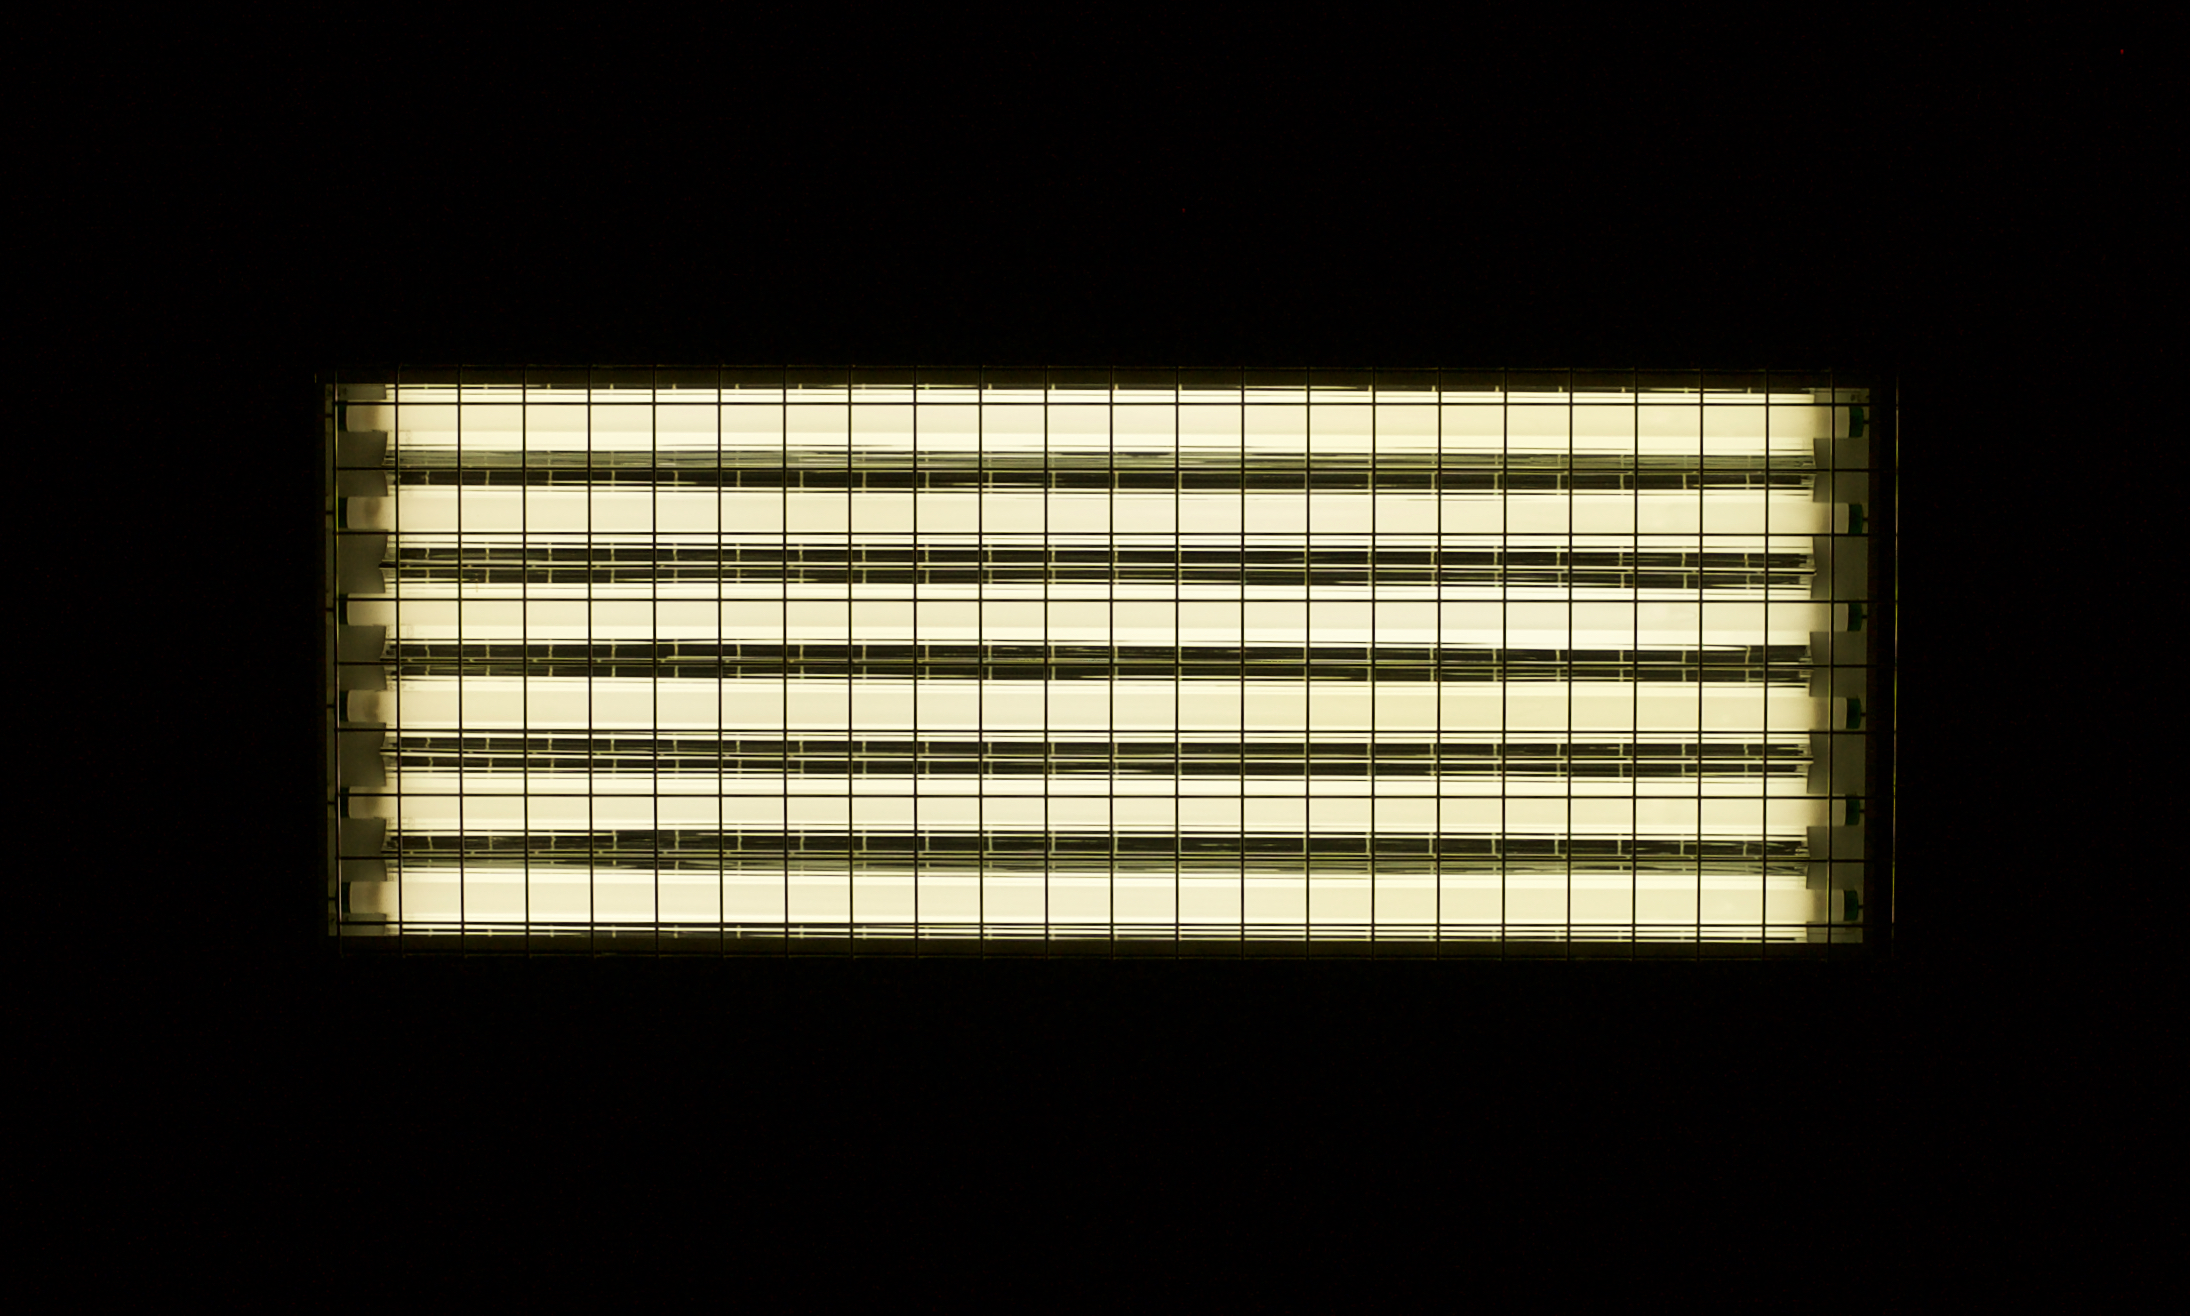 Fluorescent Rack. ALCS. Madison, Wisconsin. January 2014. © William D. Walker